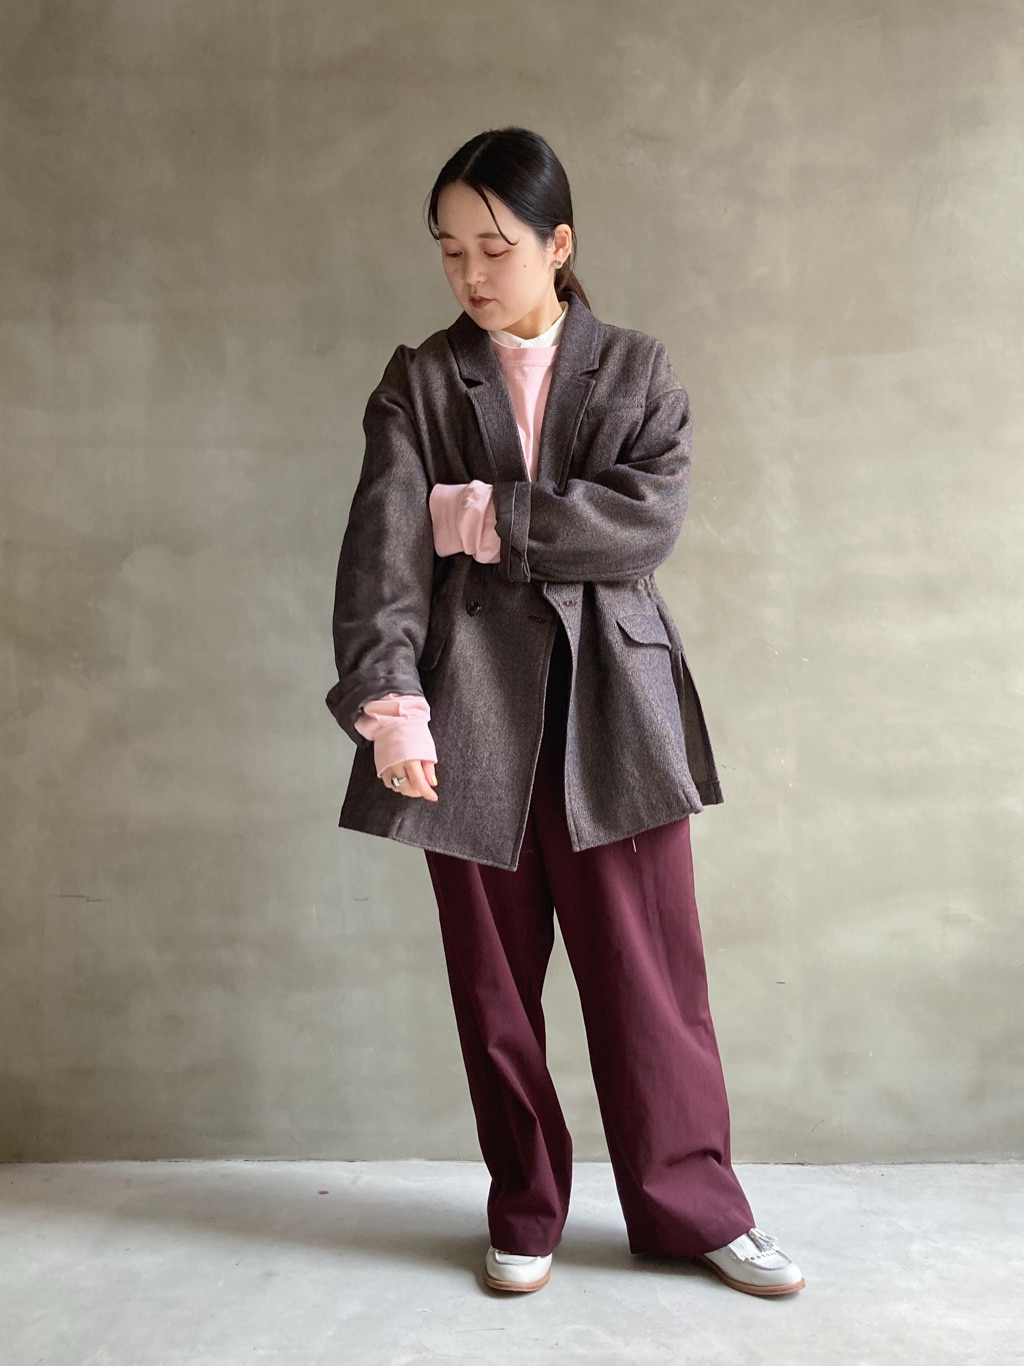 caph troupe 福岡薬院路面 身長:148cm 2020.11.16